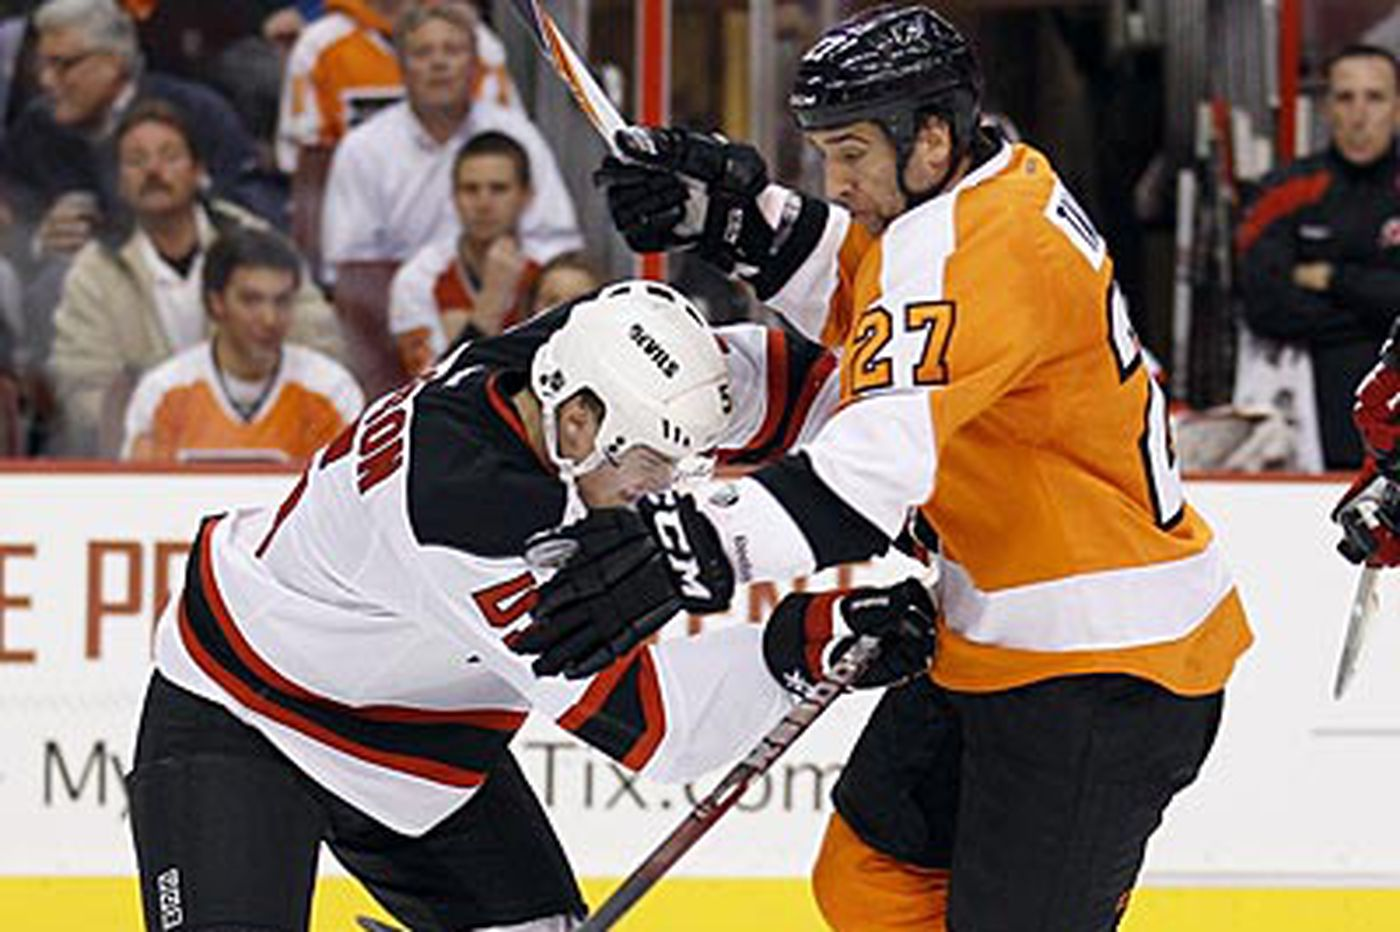 Mark Kram: Flyers think their rest will trump Devils' momentum